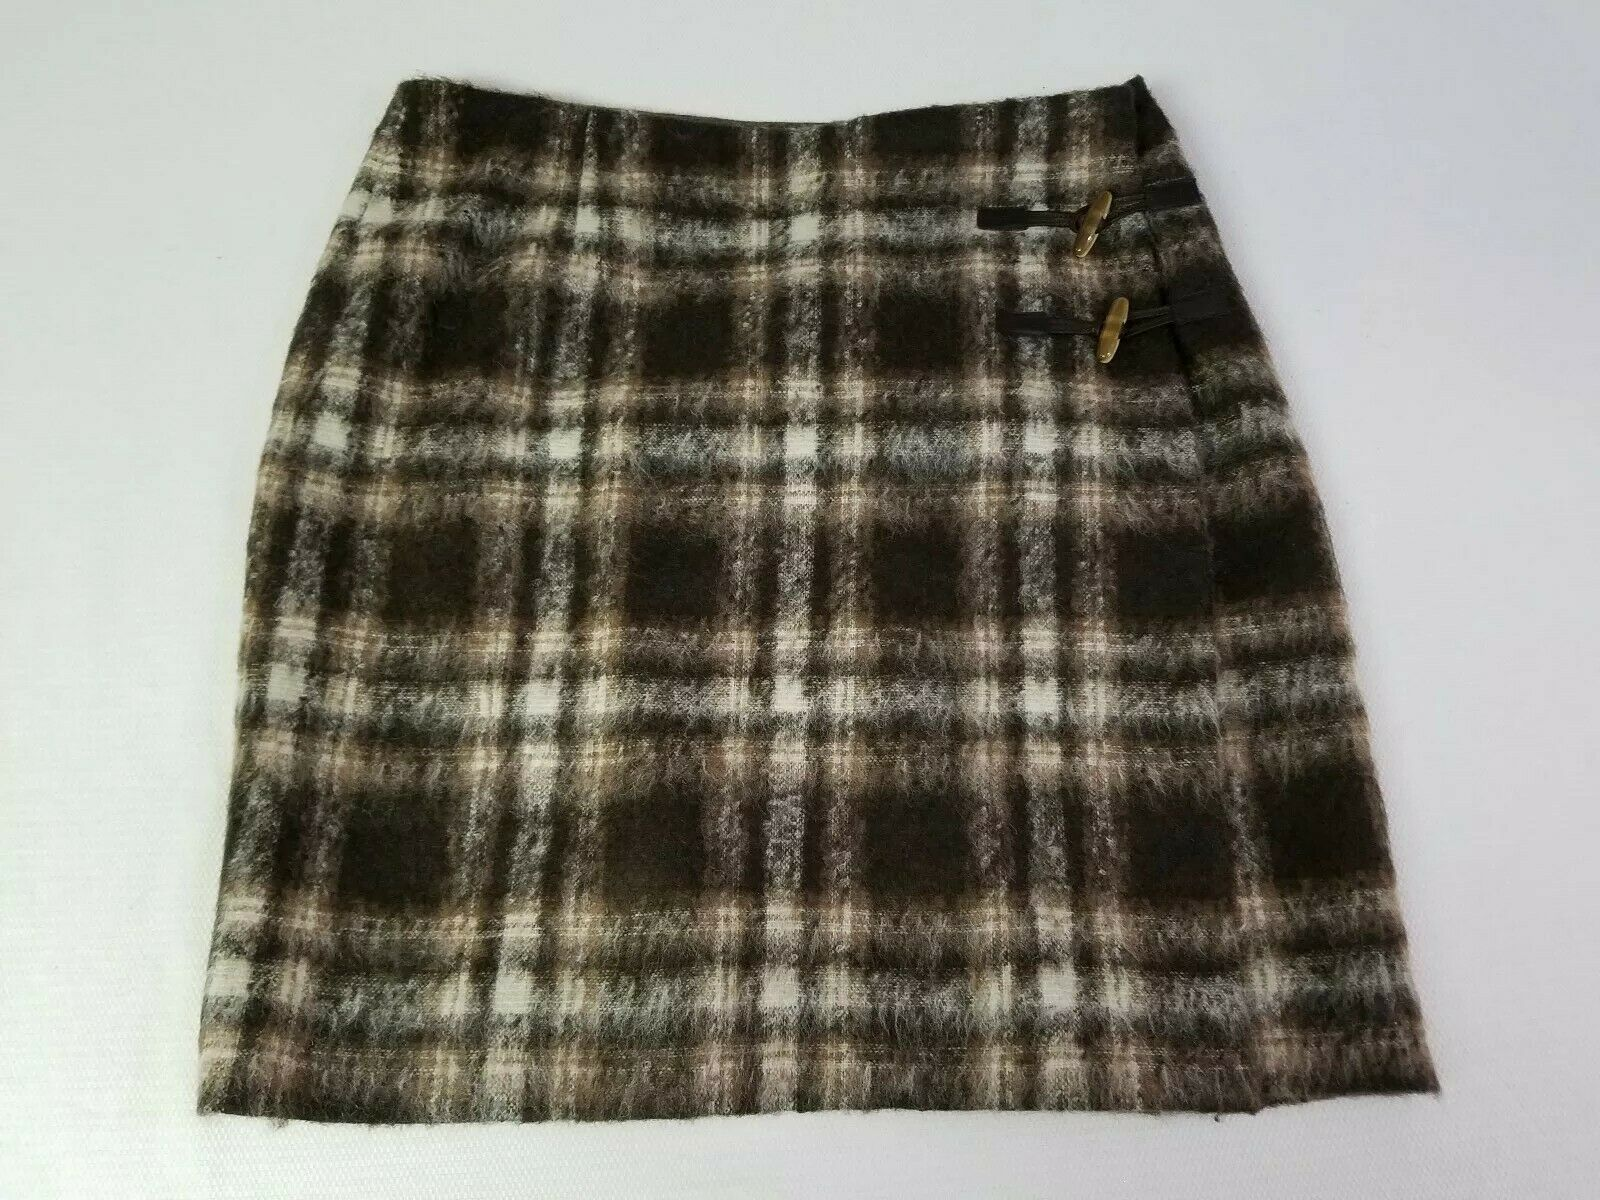 Pendleton USA  Wool Plaid Lined  Skirt Sz 14  30% wool 56% mohair 14% nylon